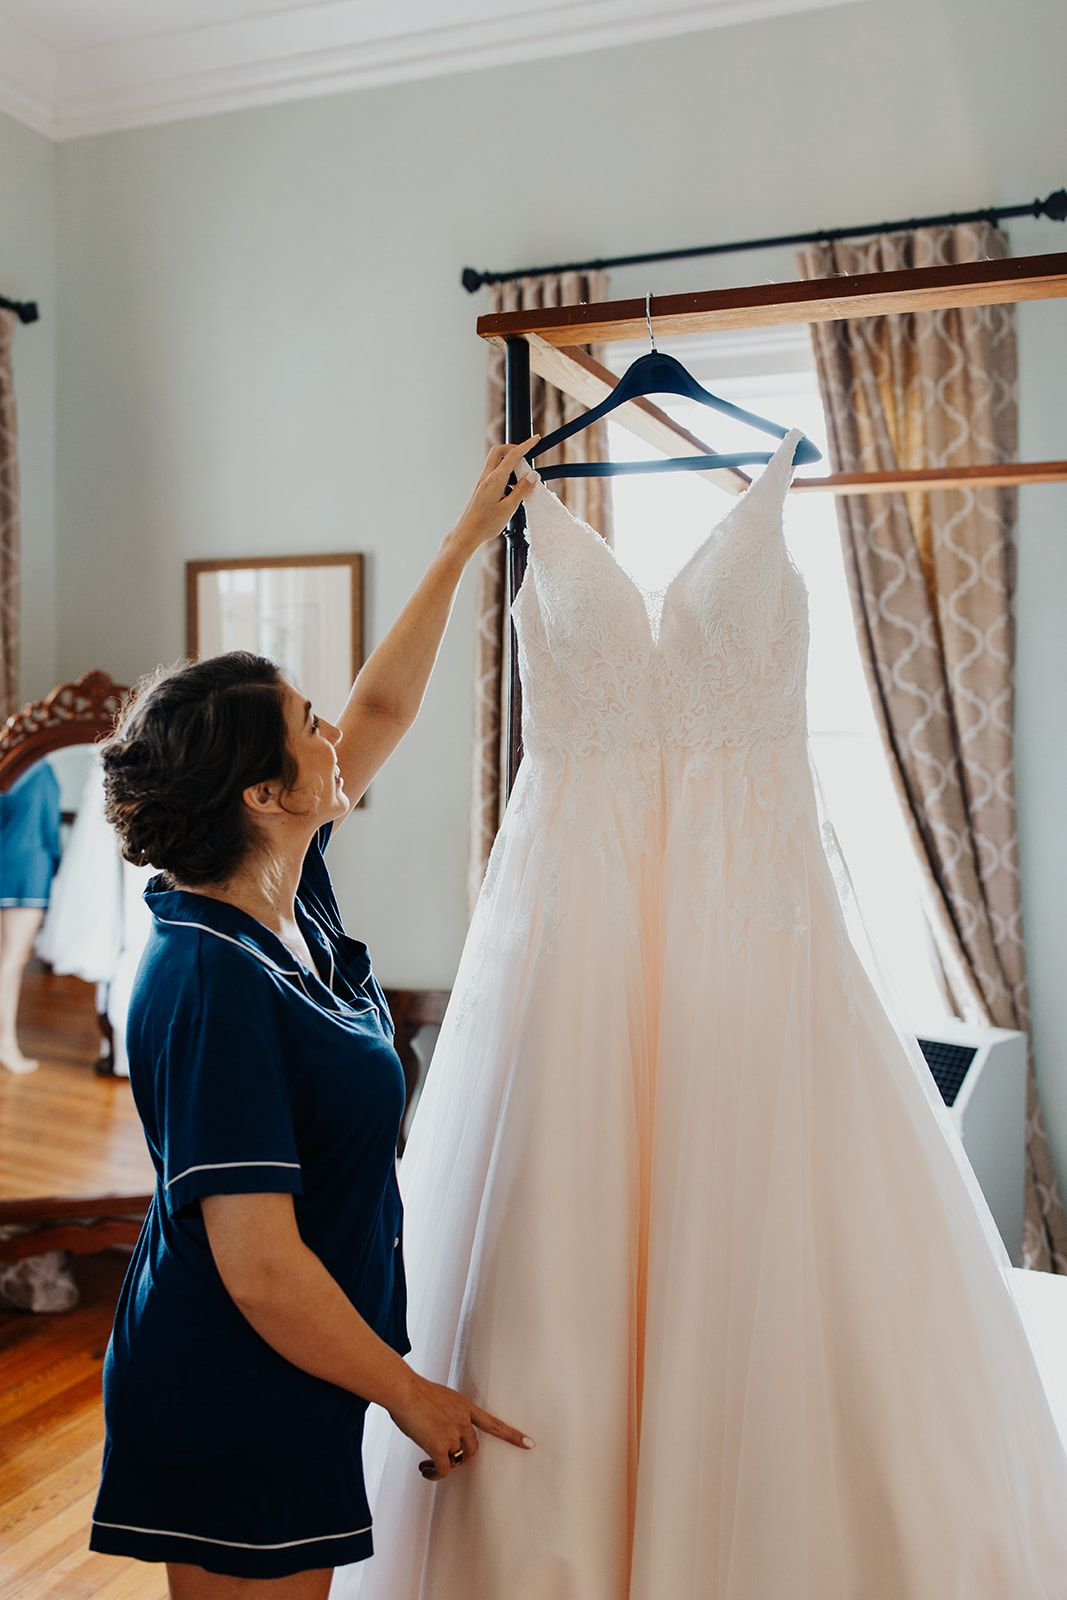 Sweet bride admiring her beautiful wedding dress hanging